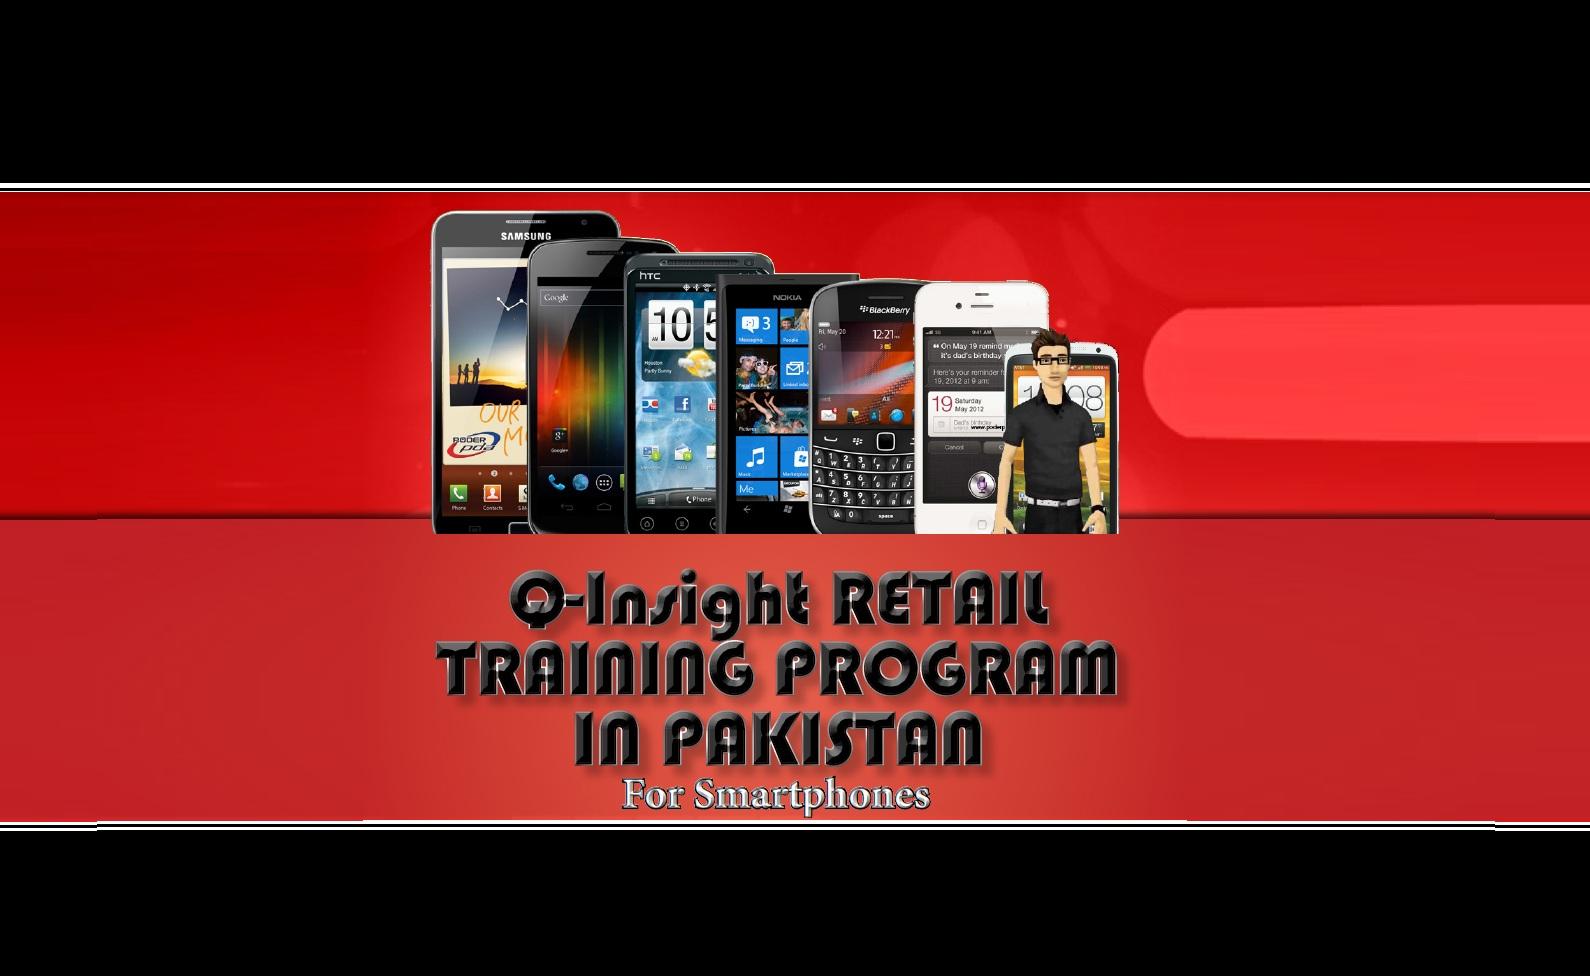 Photo of Q-Insight Retail Traning Program By CACF & Phone World